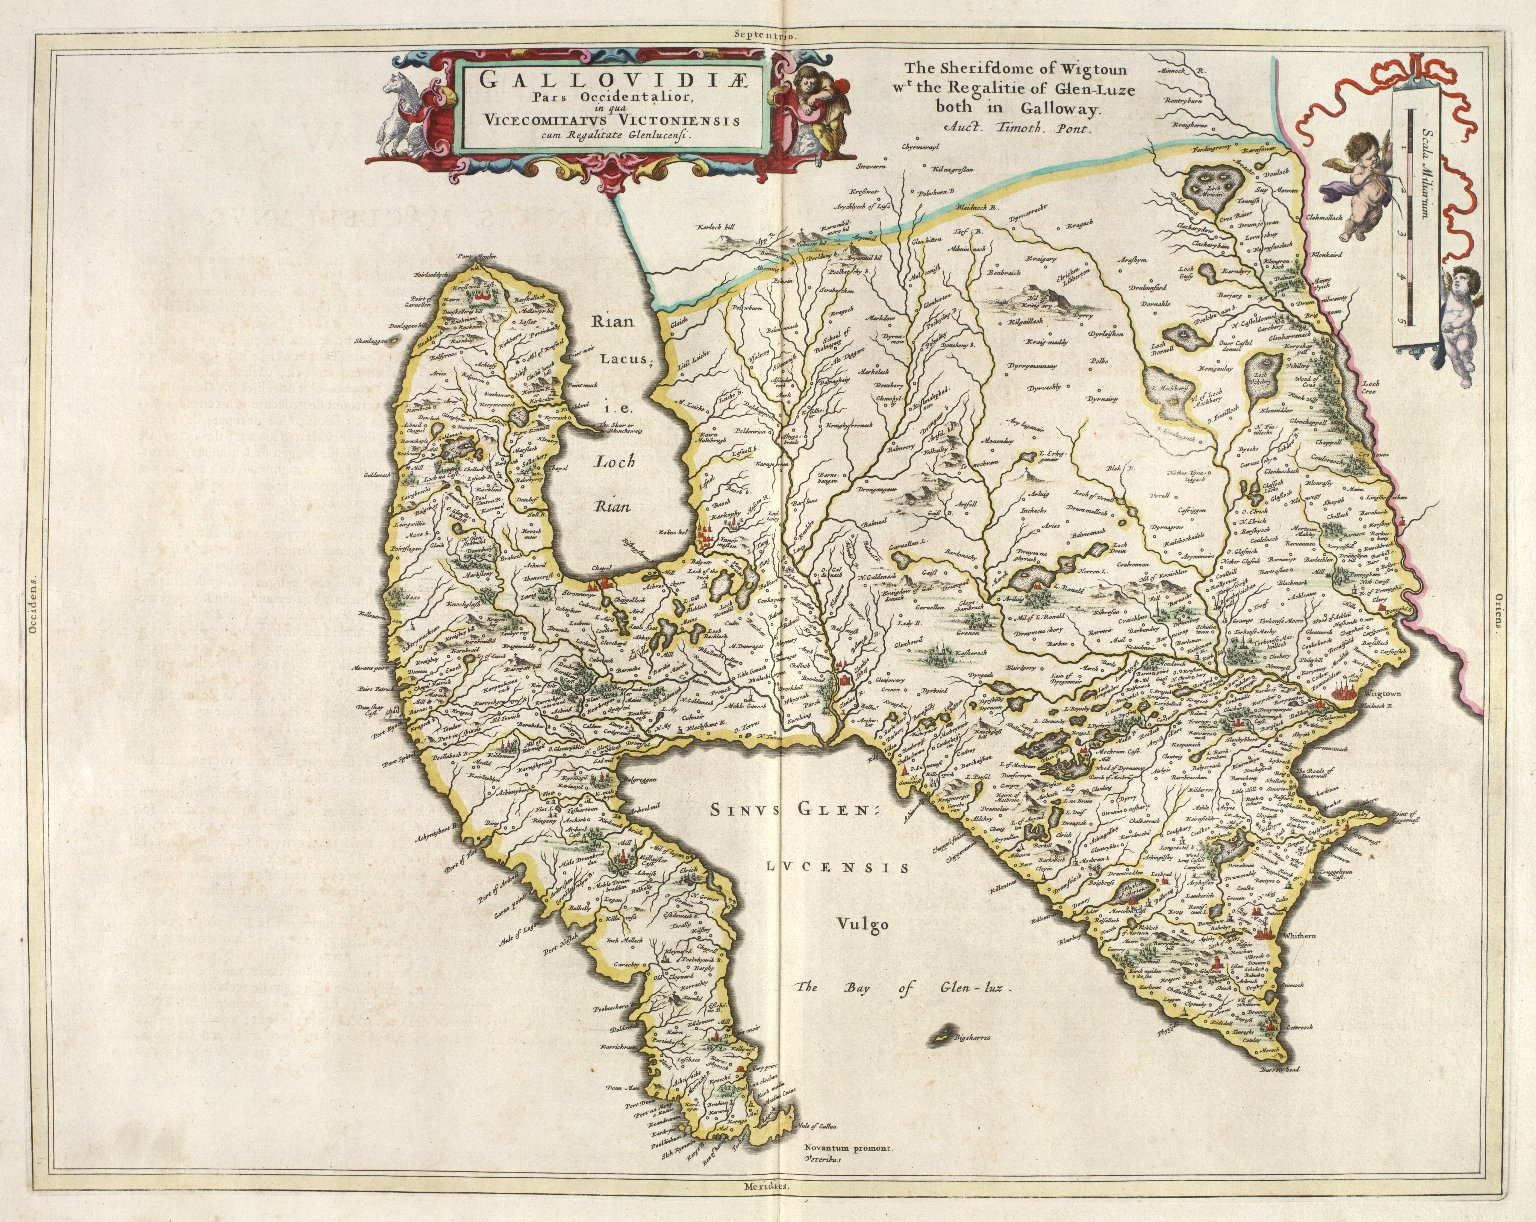 Gallovidia, vernacule Galloway [1 of 1]